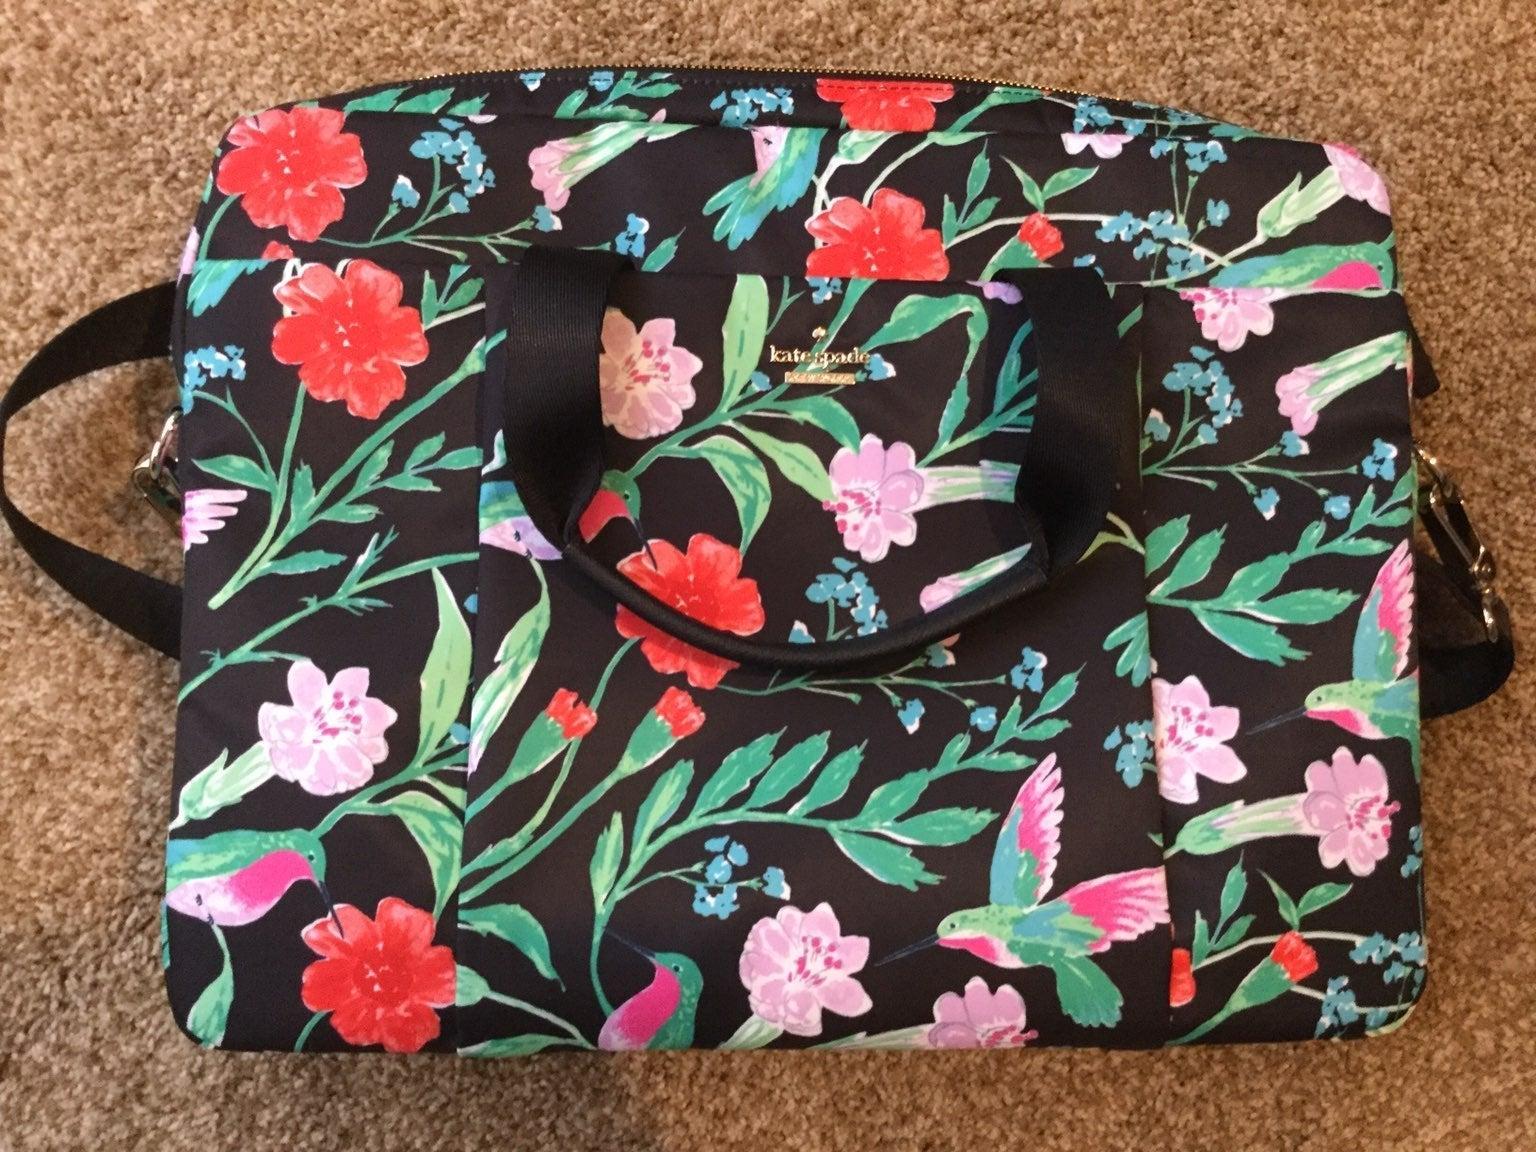 Kate Spade nylon hummingbird  briefcase